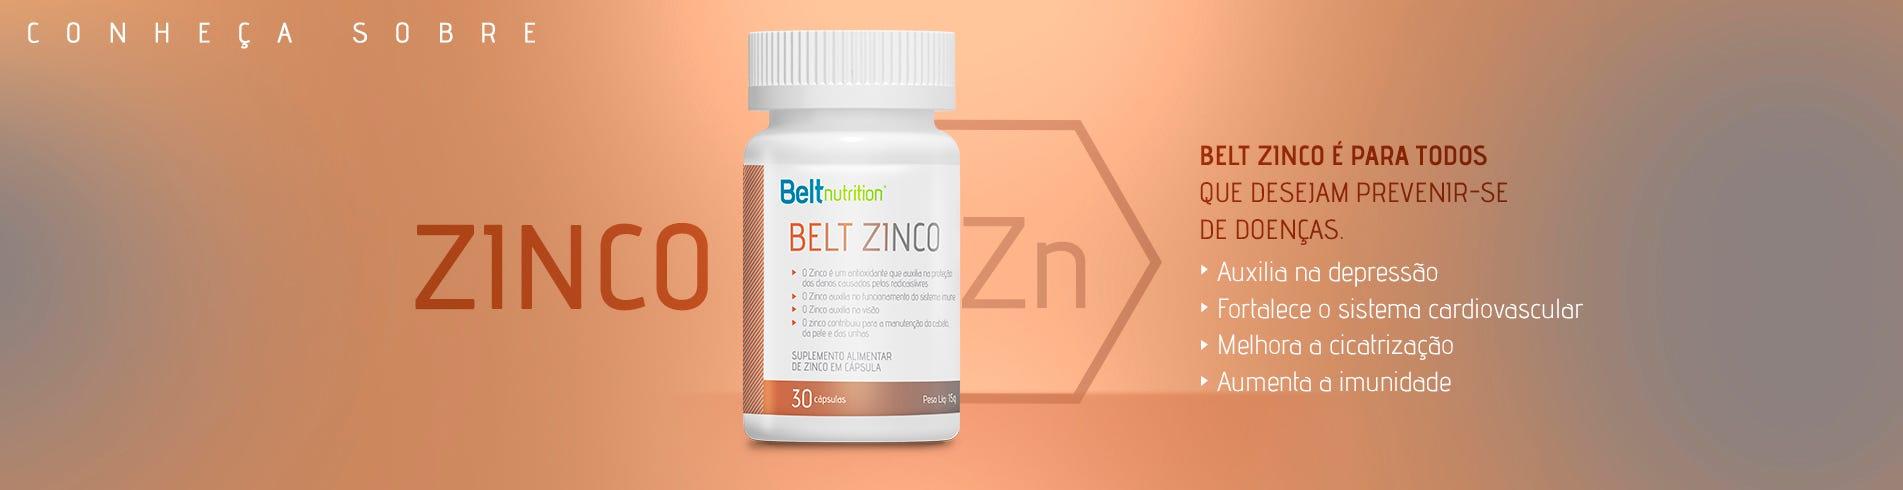 Belt Zinco